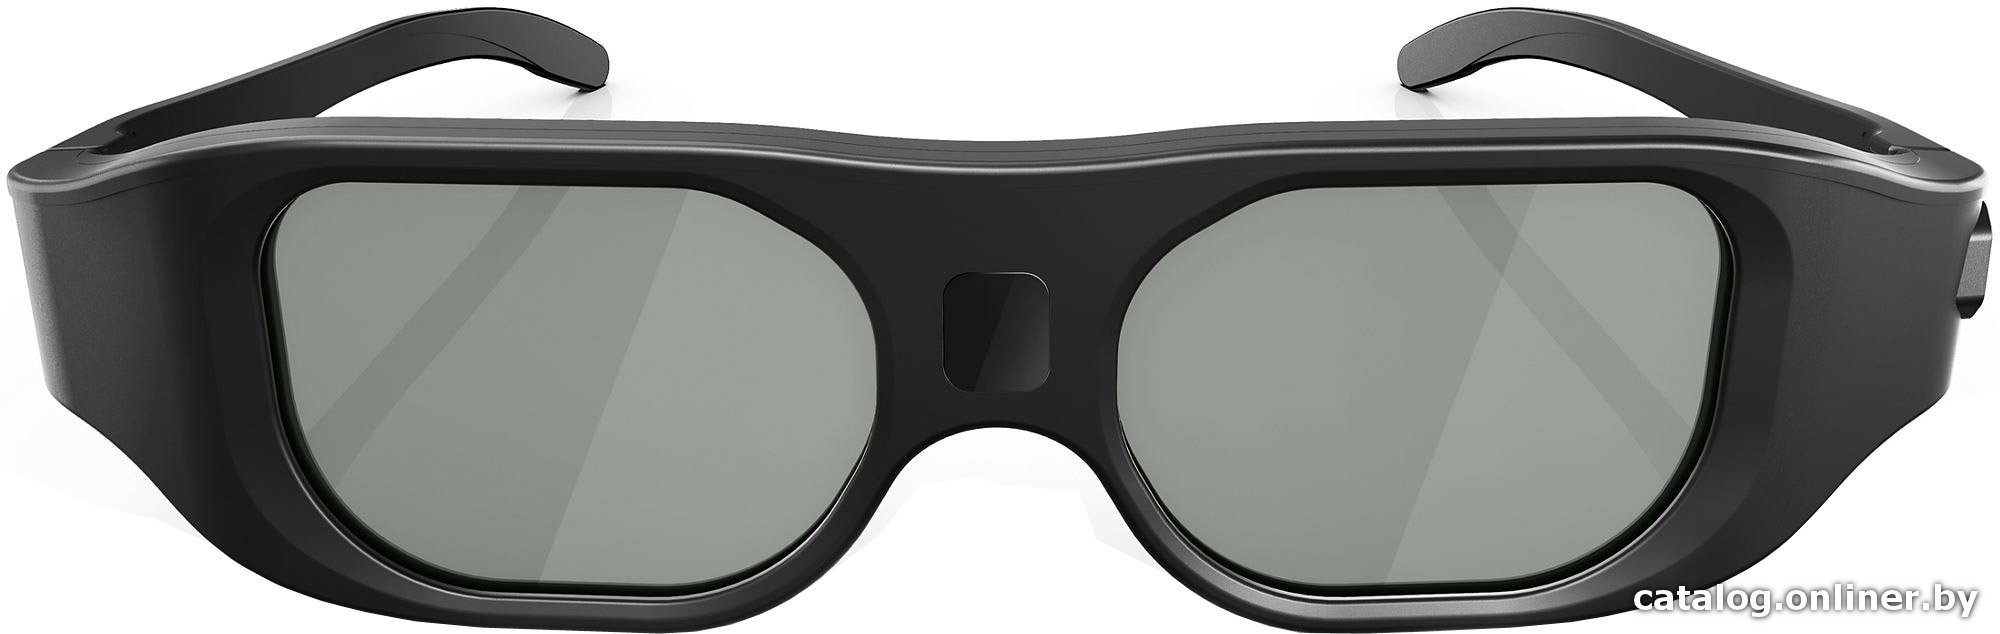 Активные 3d очки philips 17 фотография